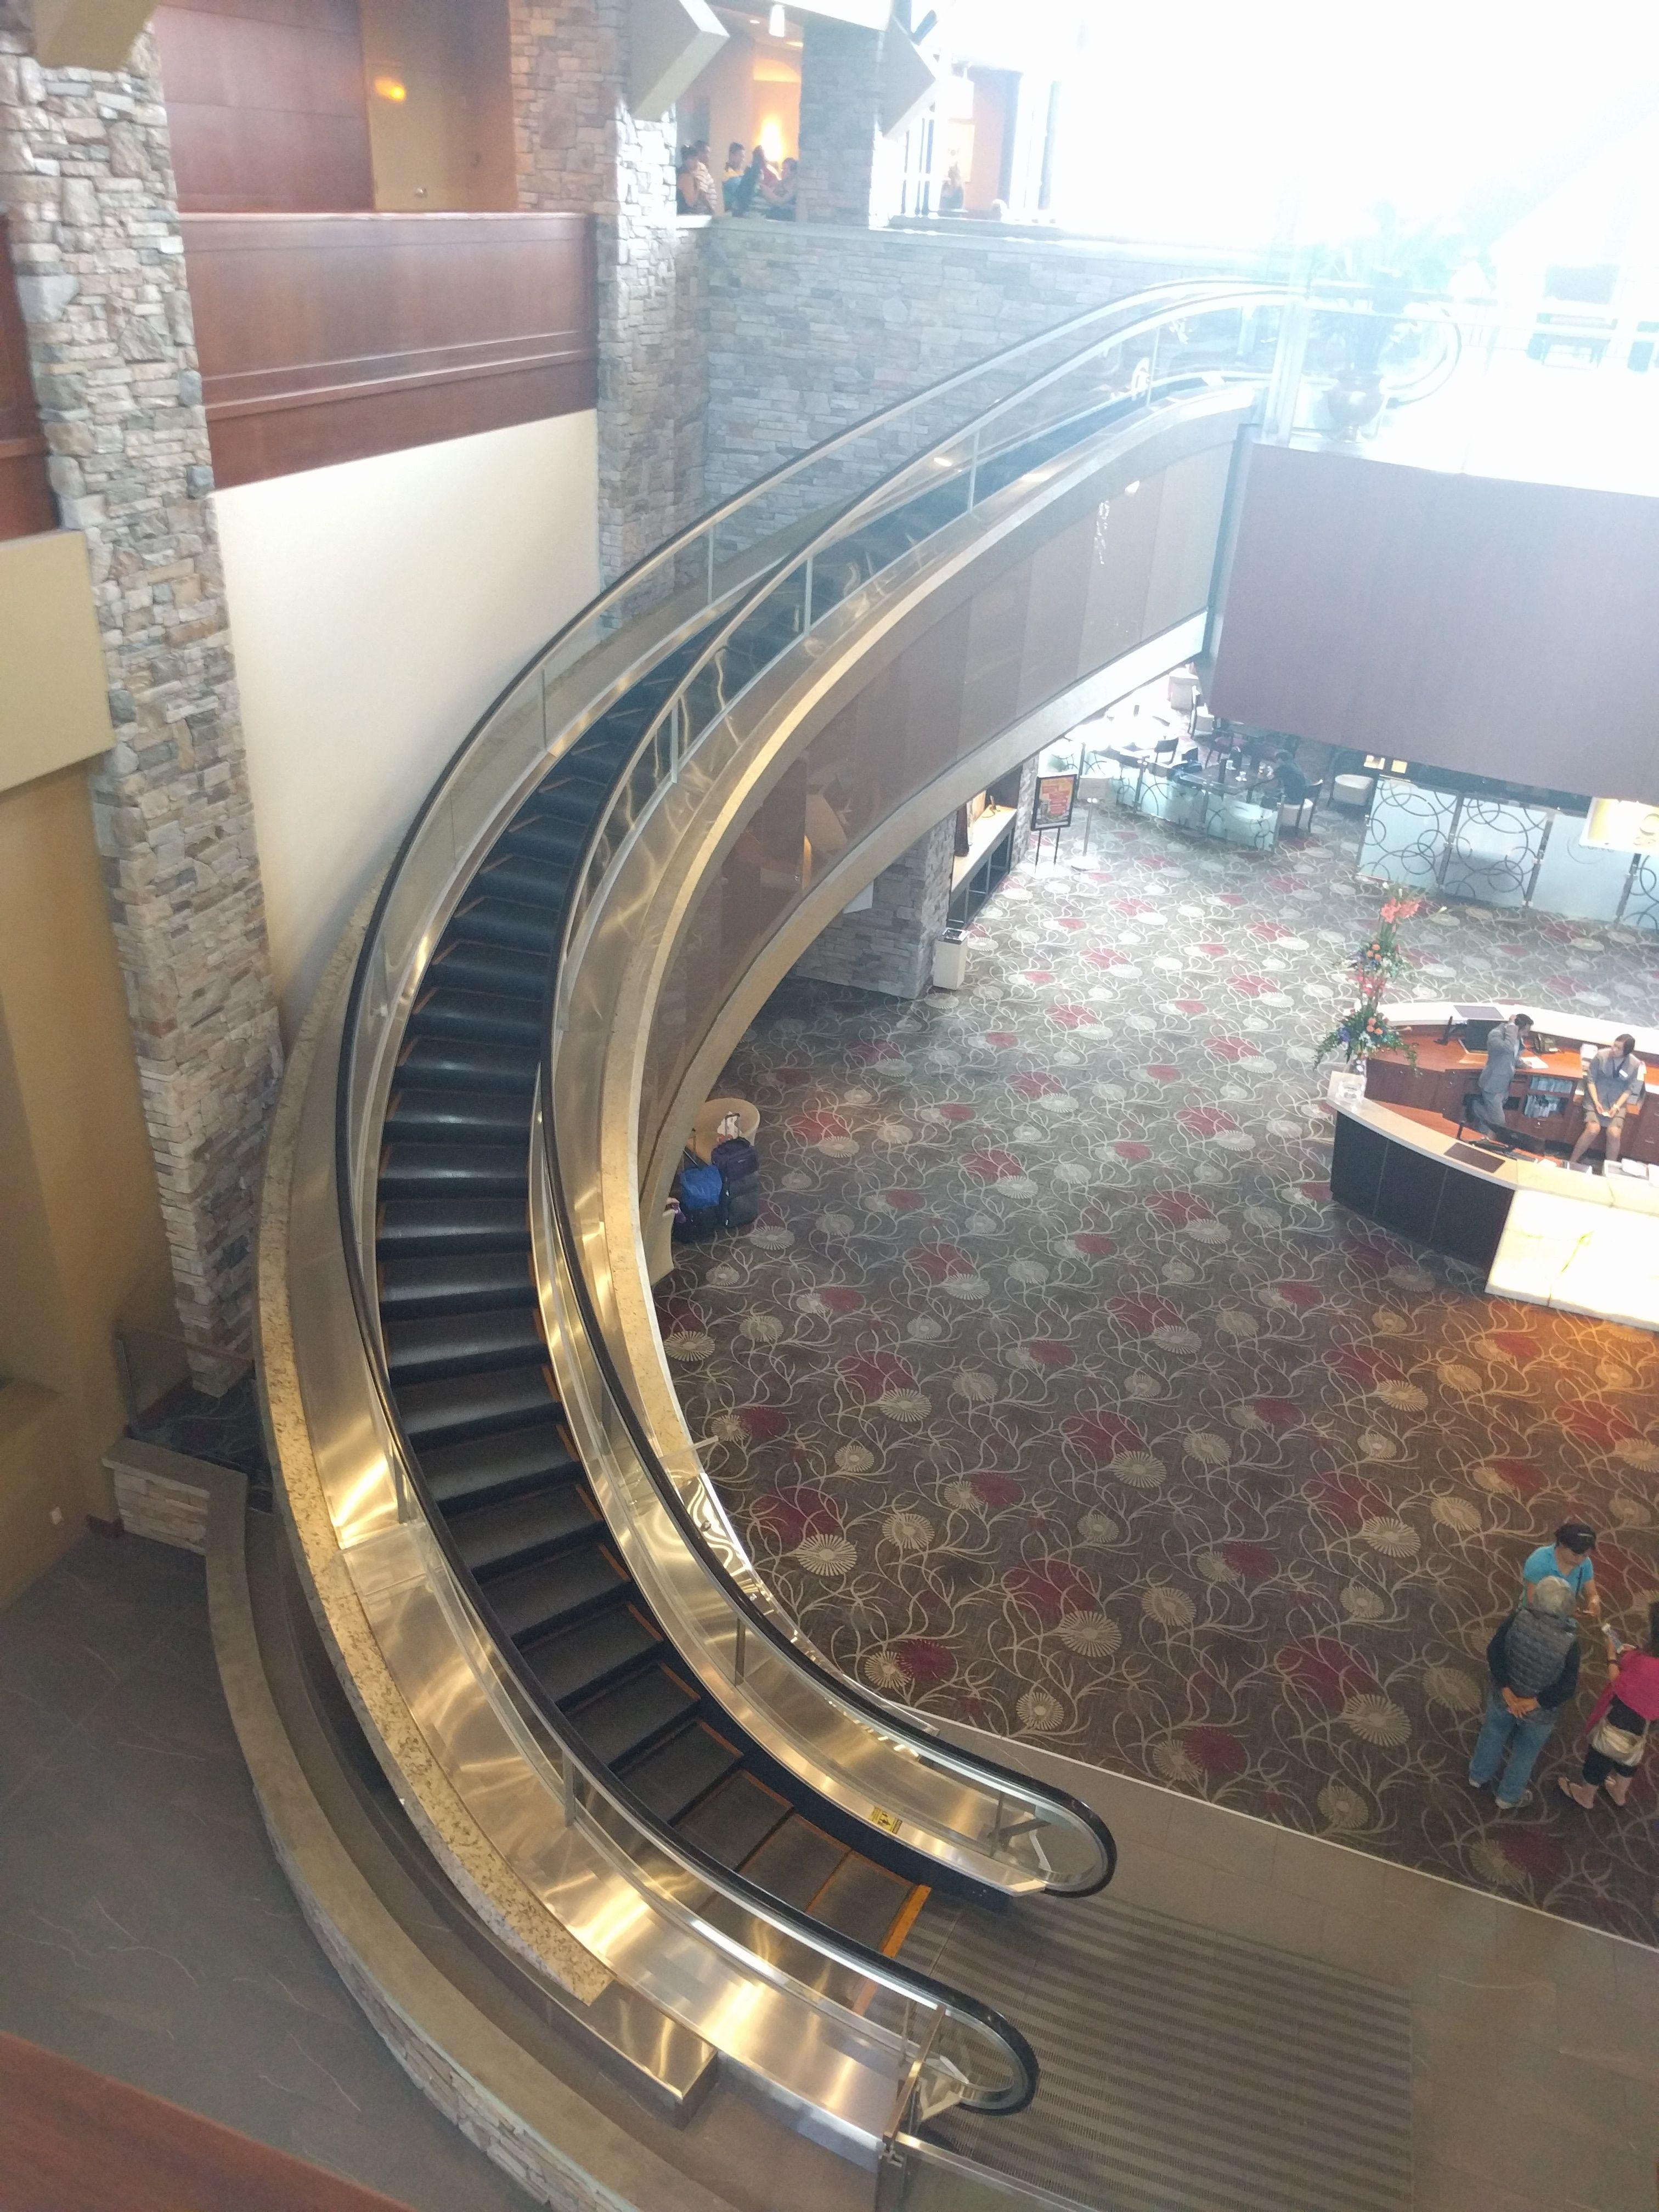 My Hotel Had Curved Escalators Curved Escalators Http Ift Tt 2cf7hjw Escalator Hotel Architecture